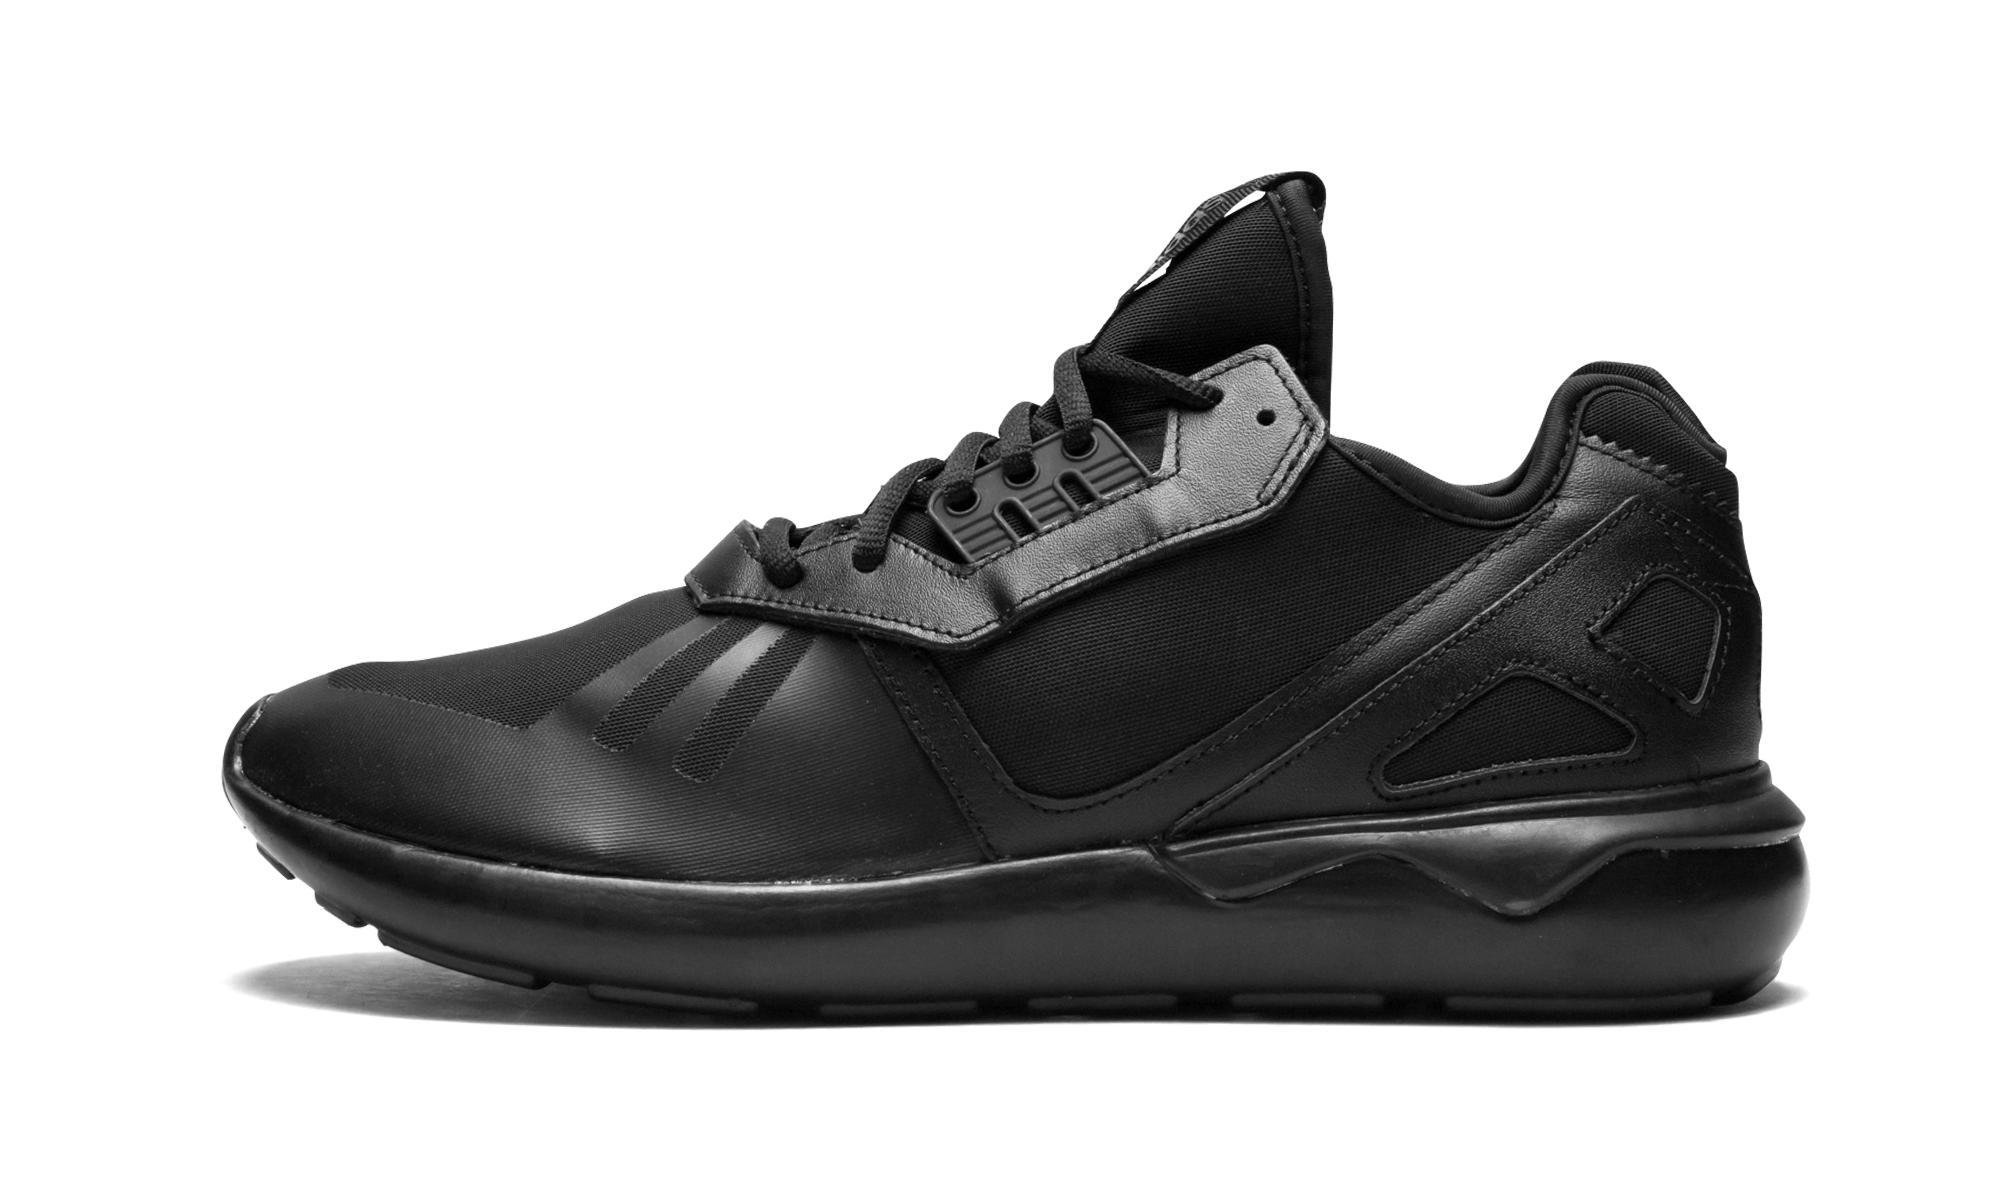 Lyst - adidas Tubular Runner W in Black for Men f20f47527